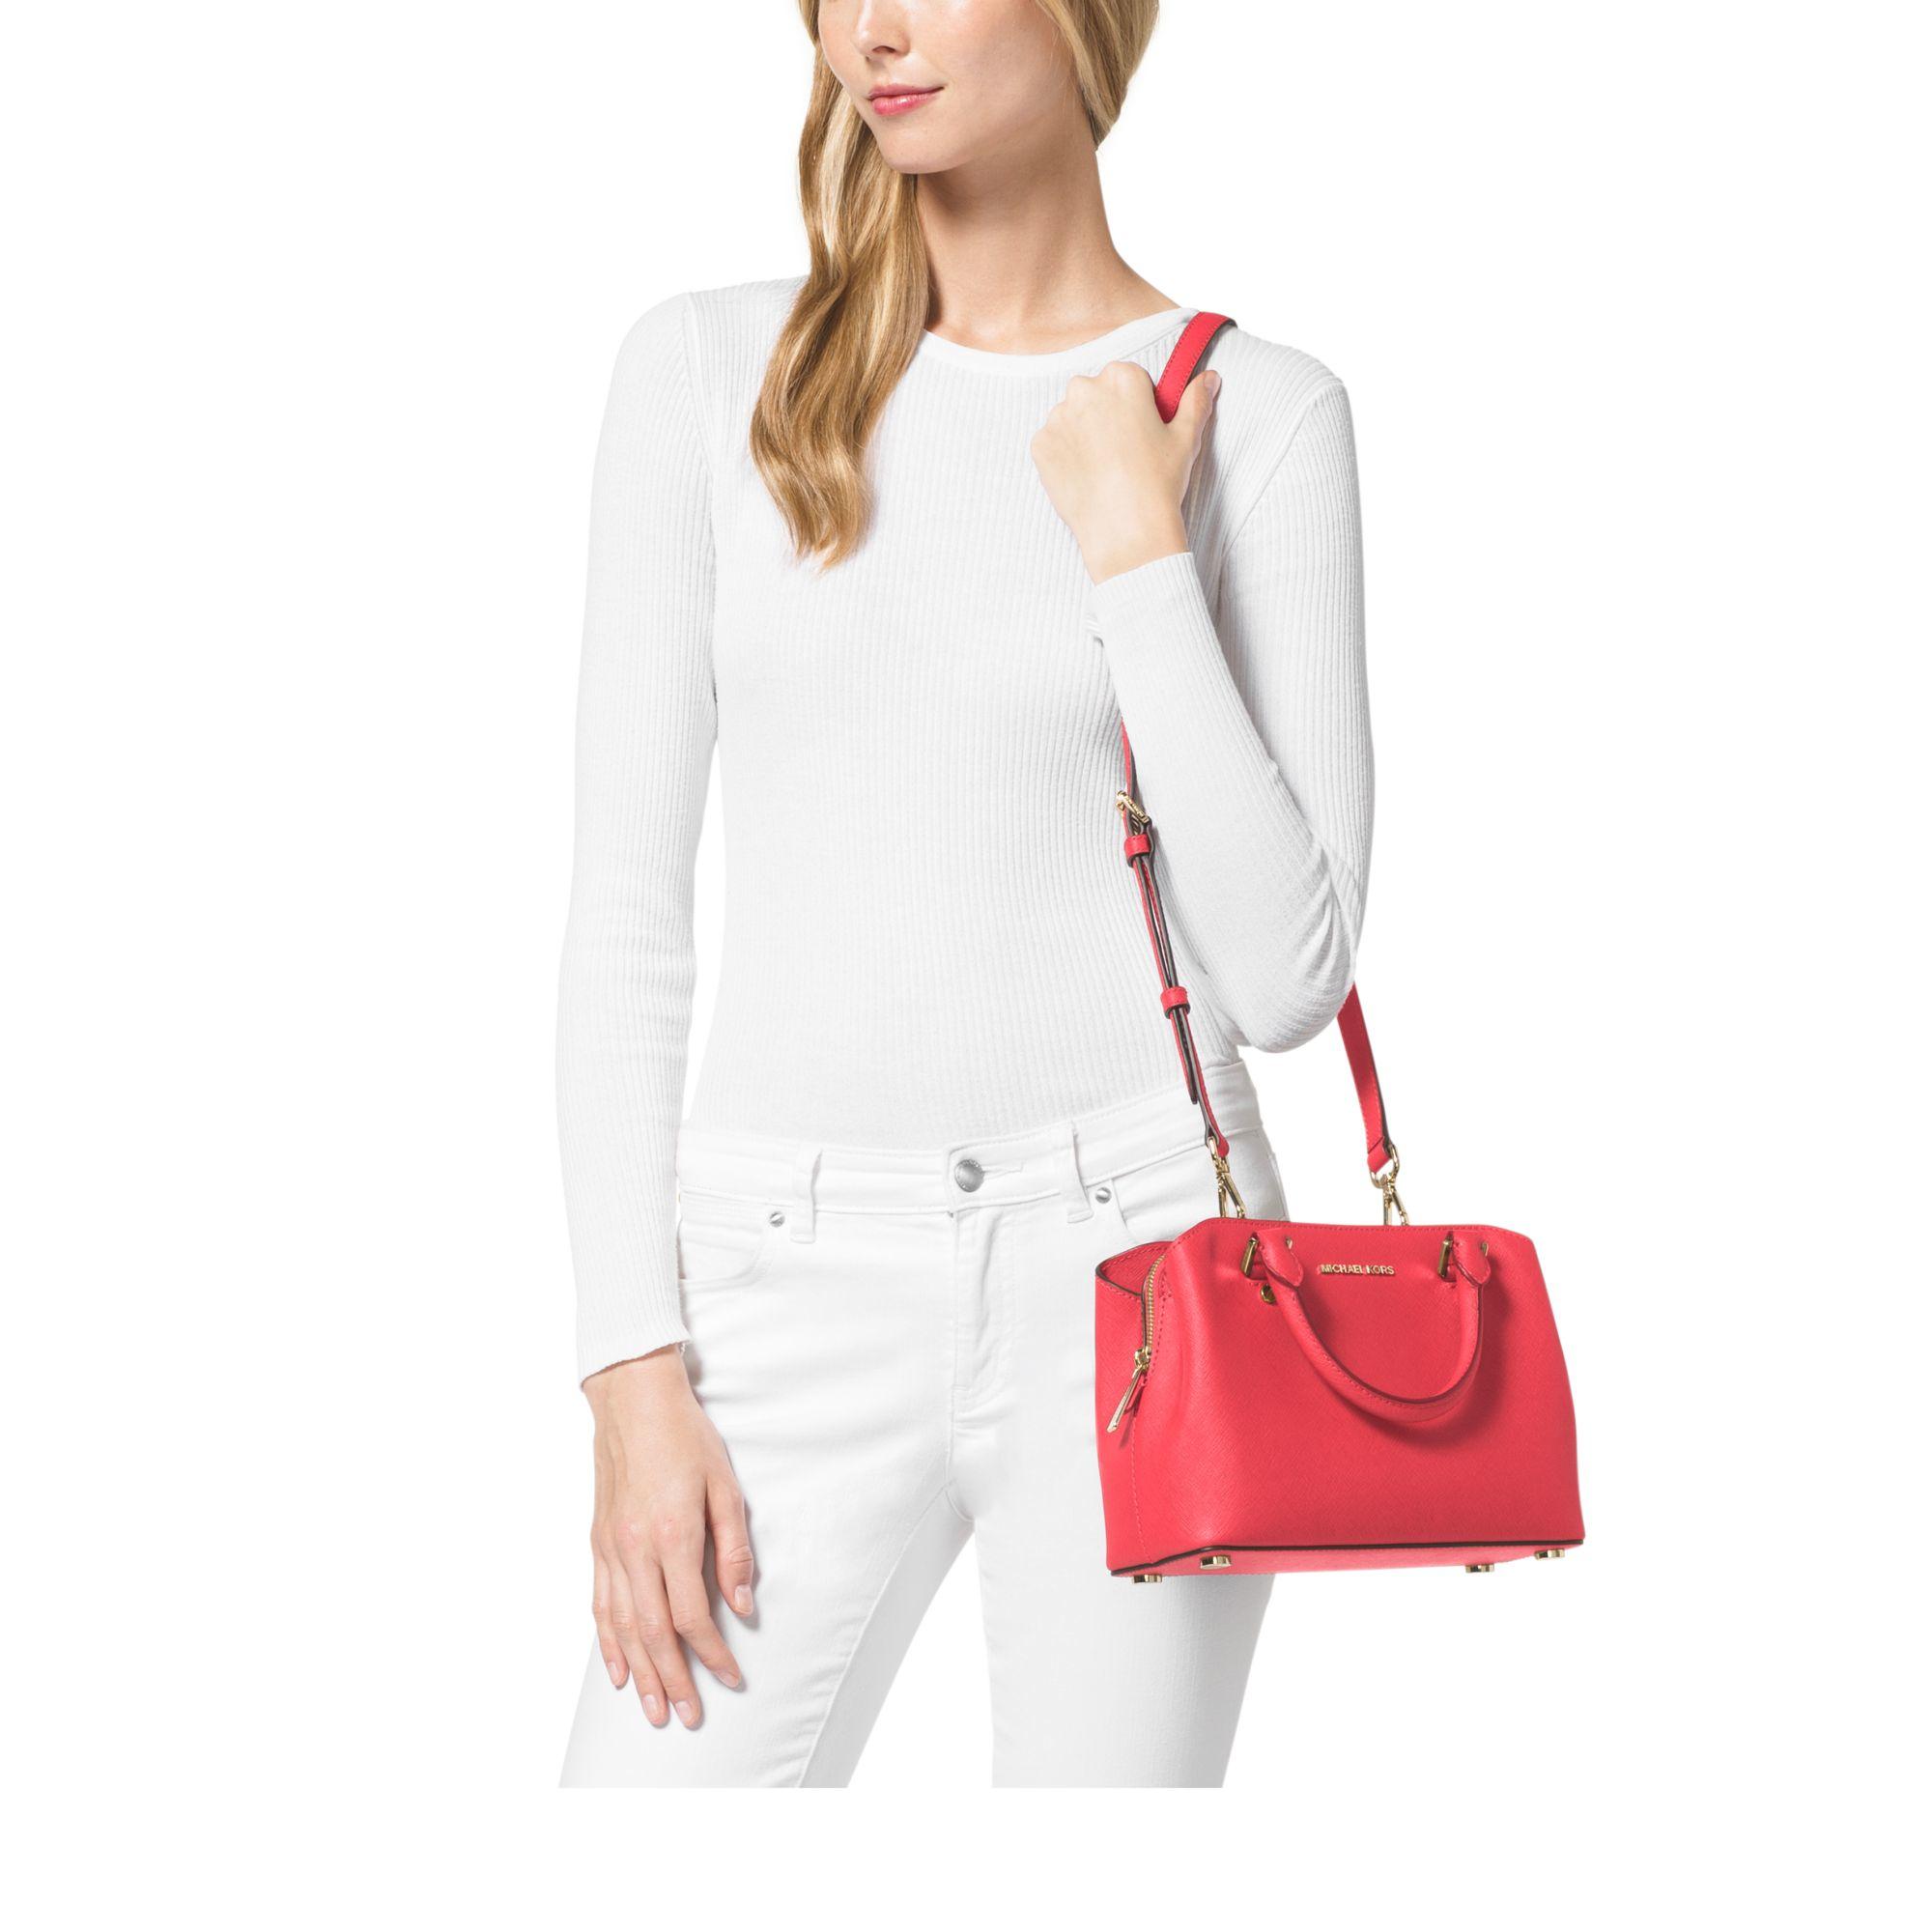 435669df24d0 Lyst - Michael Kors Savannah Small Saffiano Leather Satchel in Pink